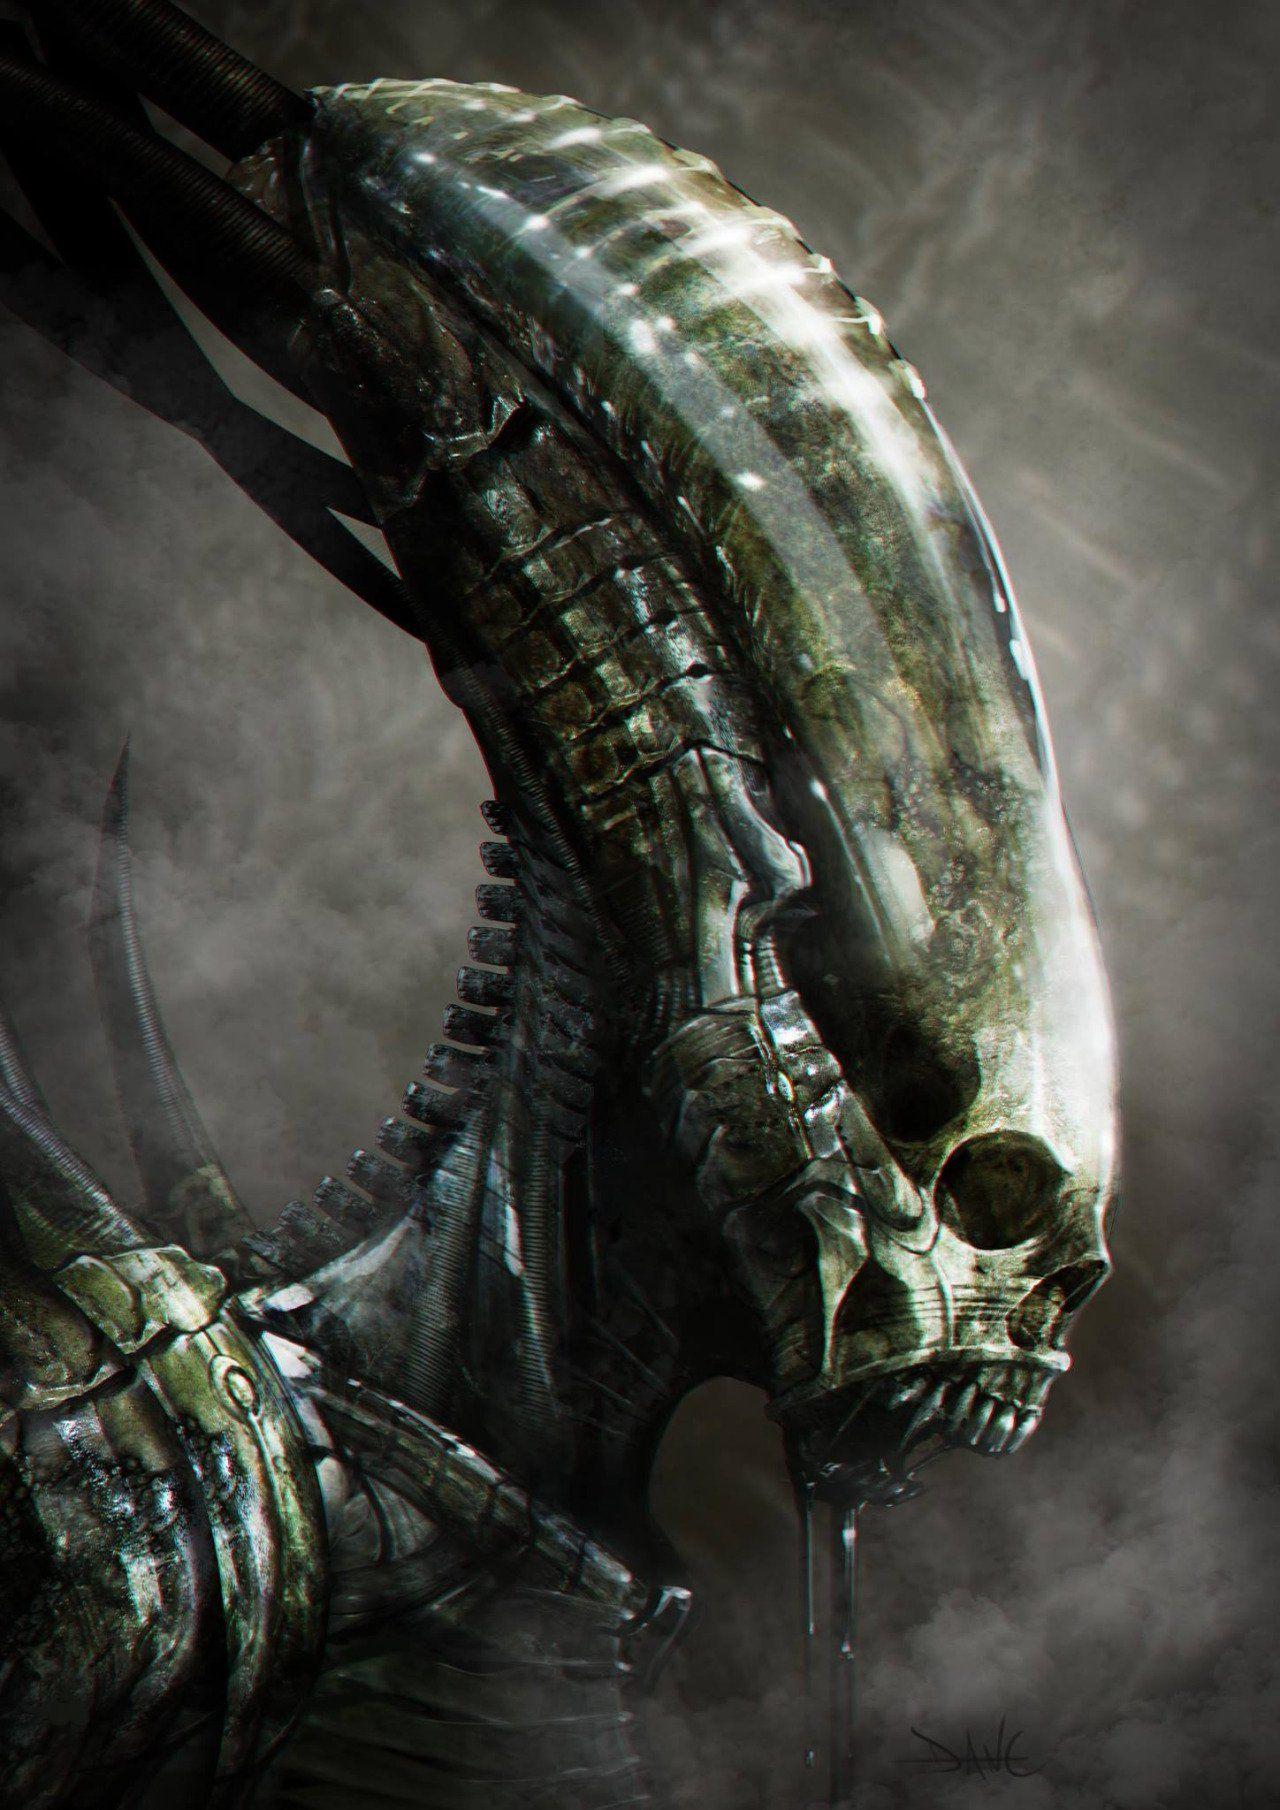 New Alien: Covenant Xenomorph head design revealed? (Updated & Clarified)